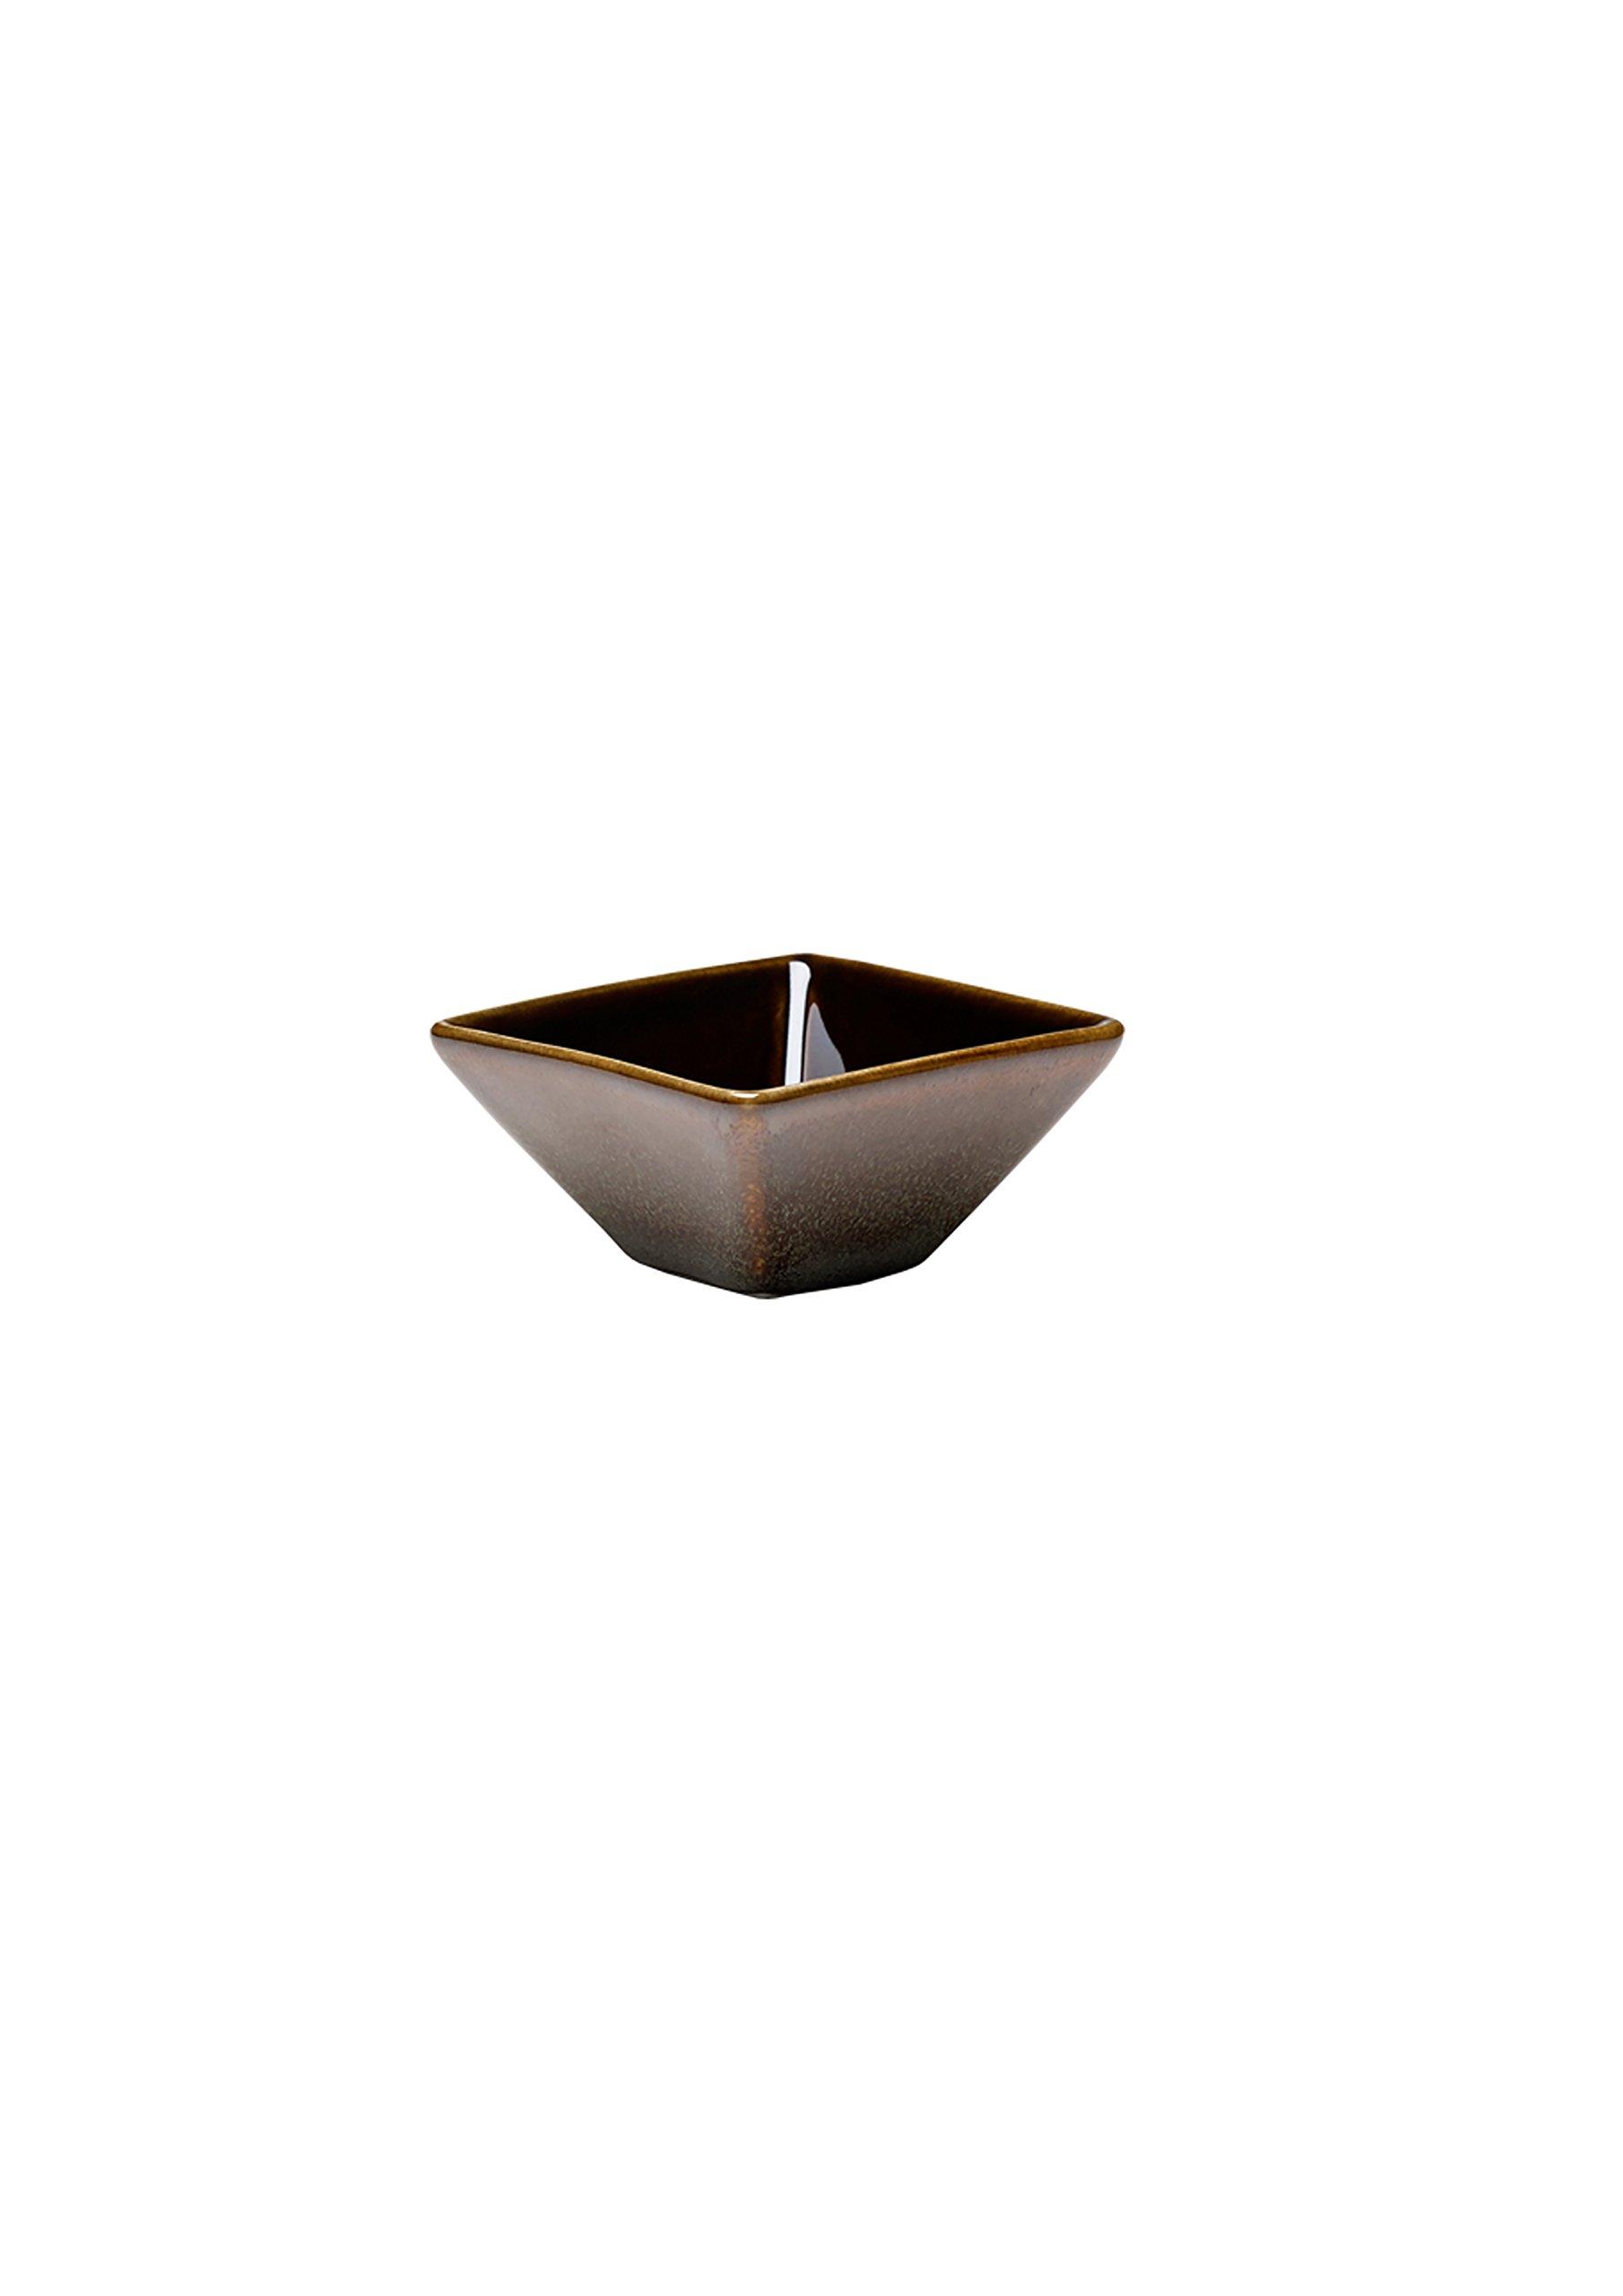 Oneida Foodservice L6753059940 Square / Triangular Sauce Dish 2.75'', Rustic Chestnut